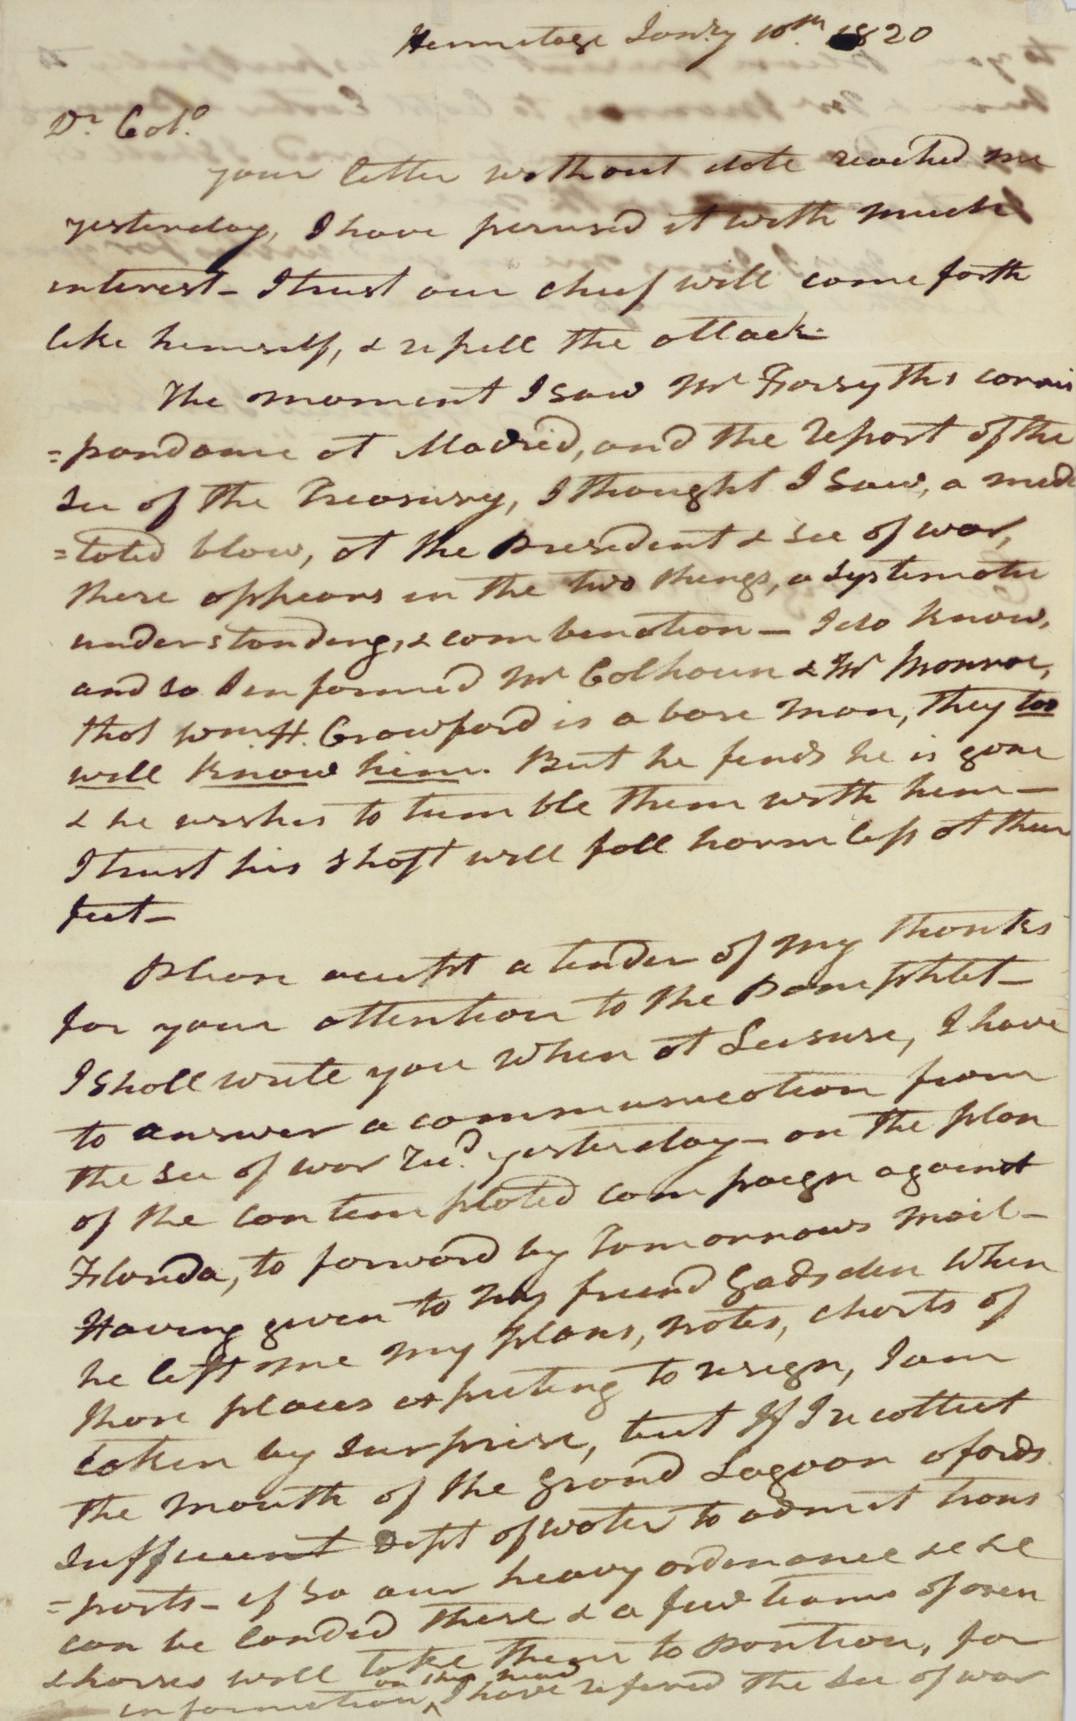 JACKSON, Andrew )1767-1845). A